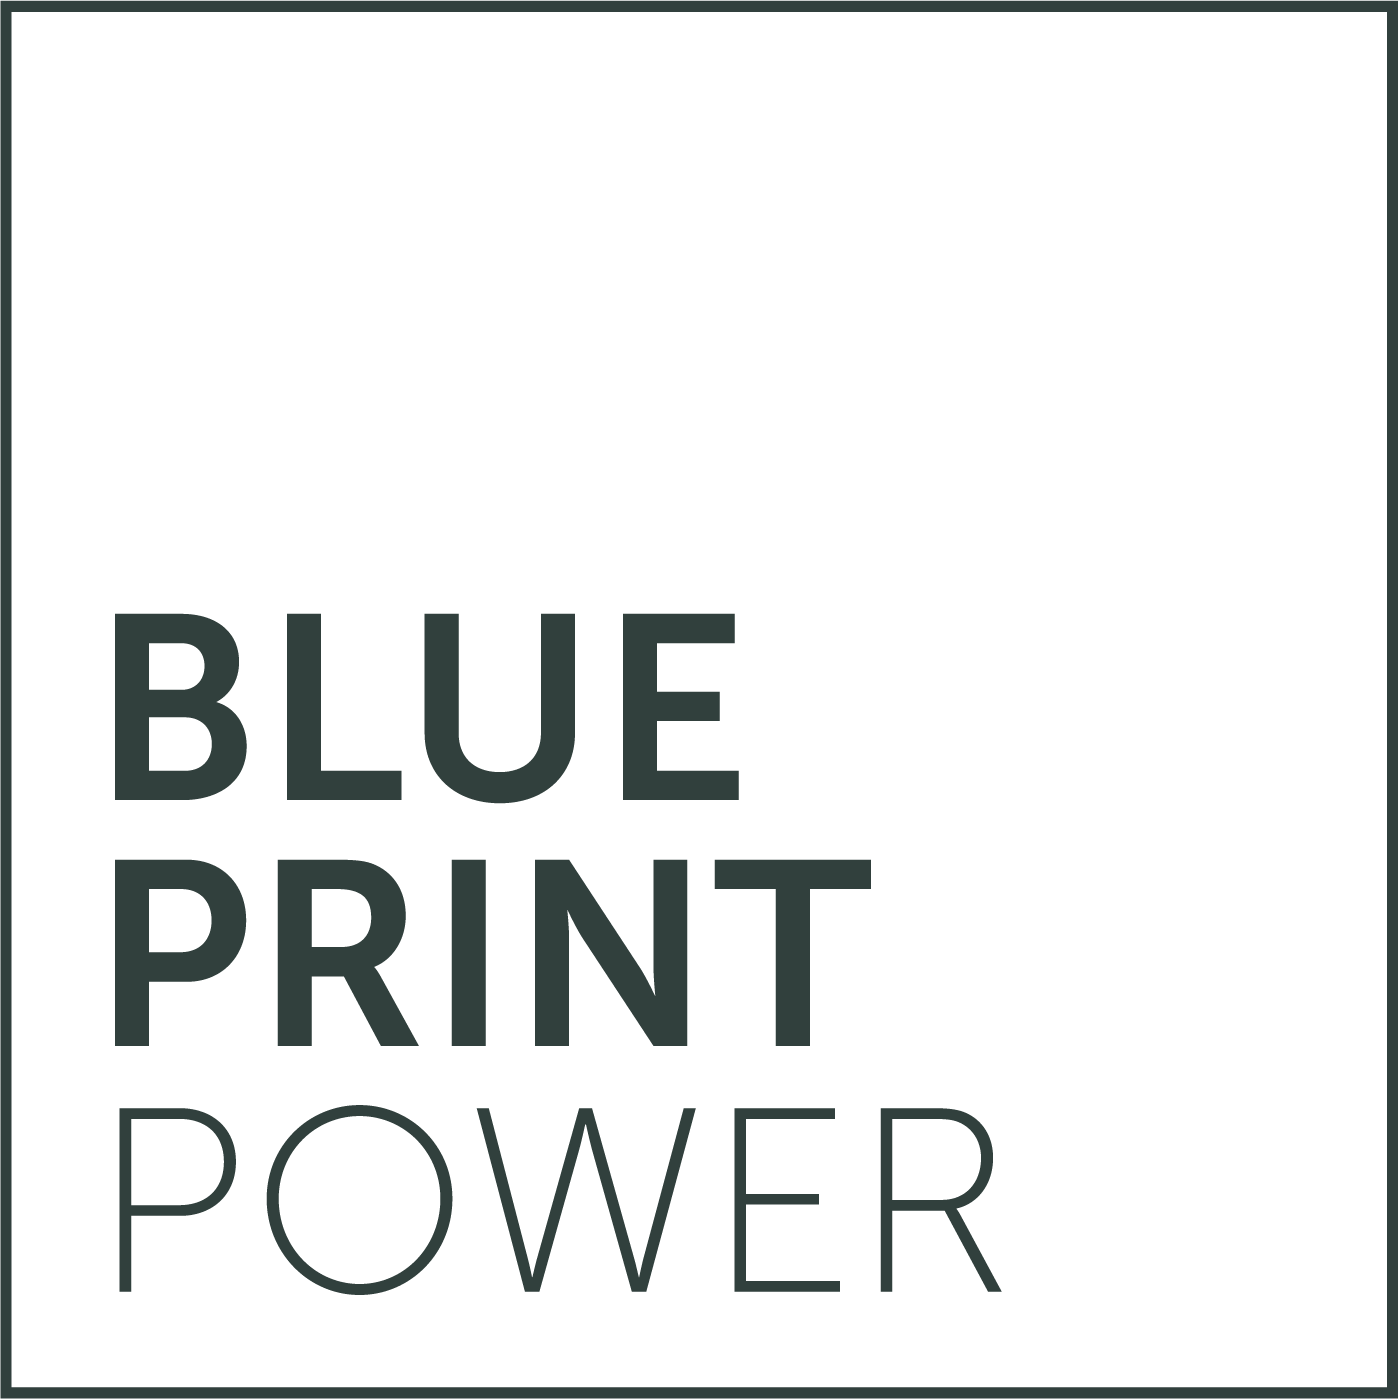 Senior full stack software engineer at blueprint power peersight senior full stack software engineer at blueprint power malvernweather Images